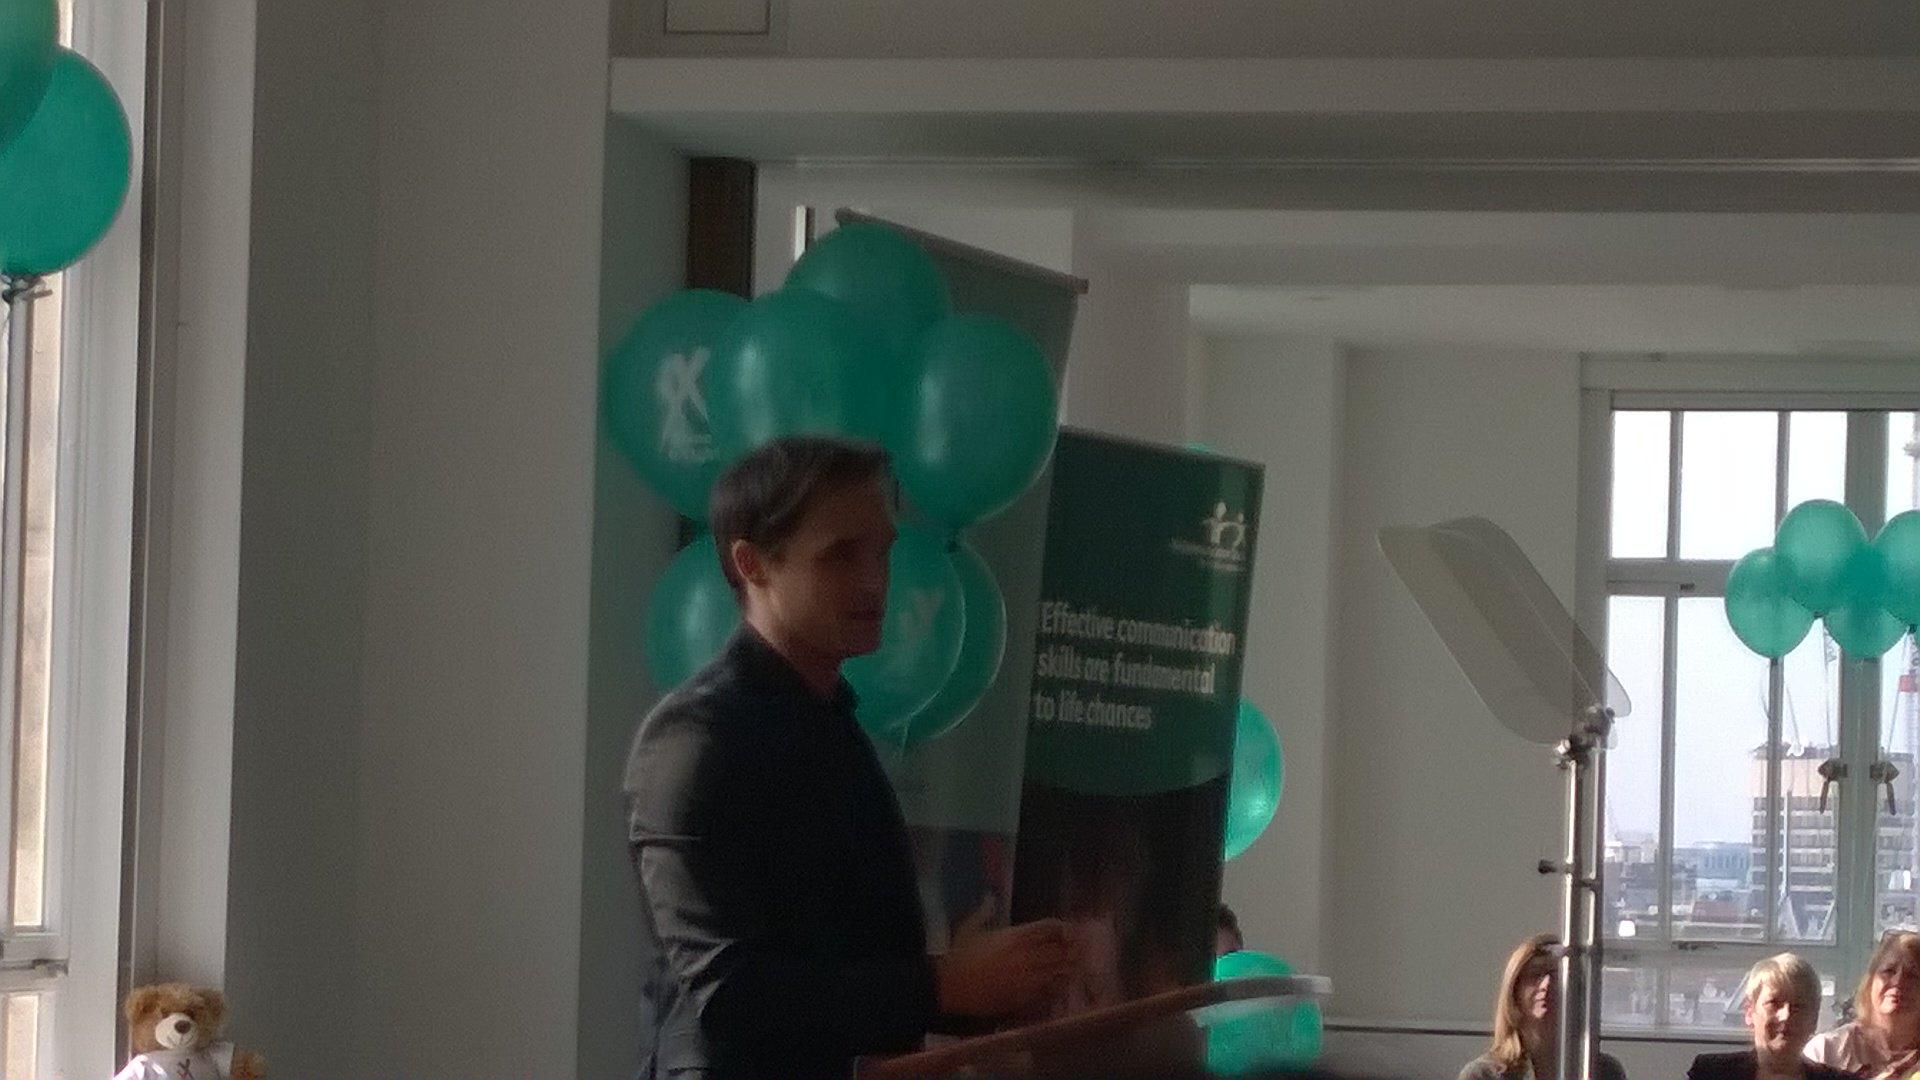 RT @stammer: .@Gareth_Gates opening the Shine a Light awards #SALawards https://t.co/0RNPKznyLF